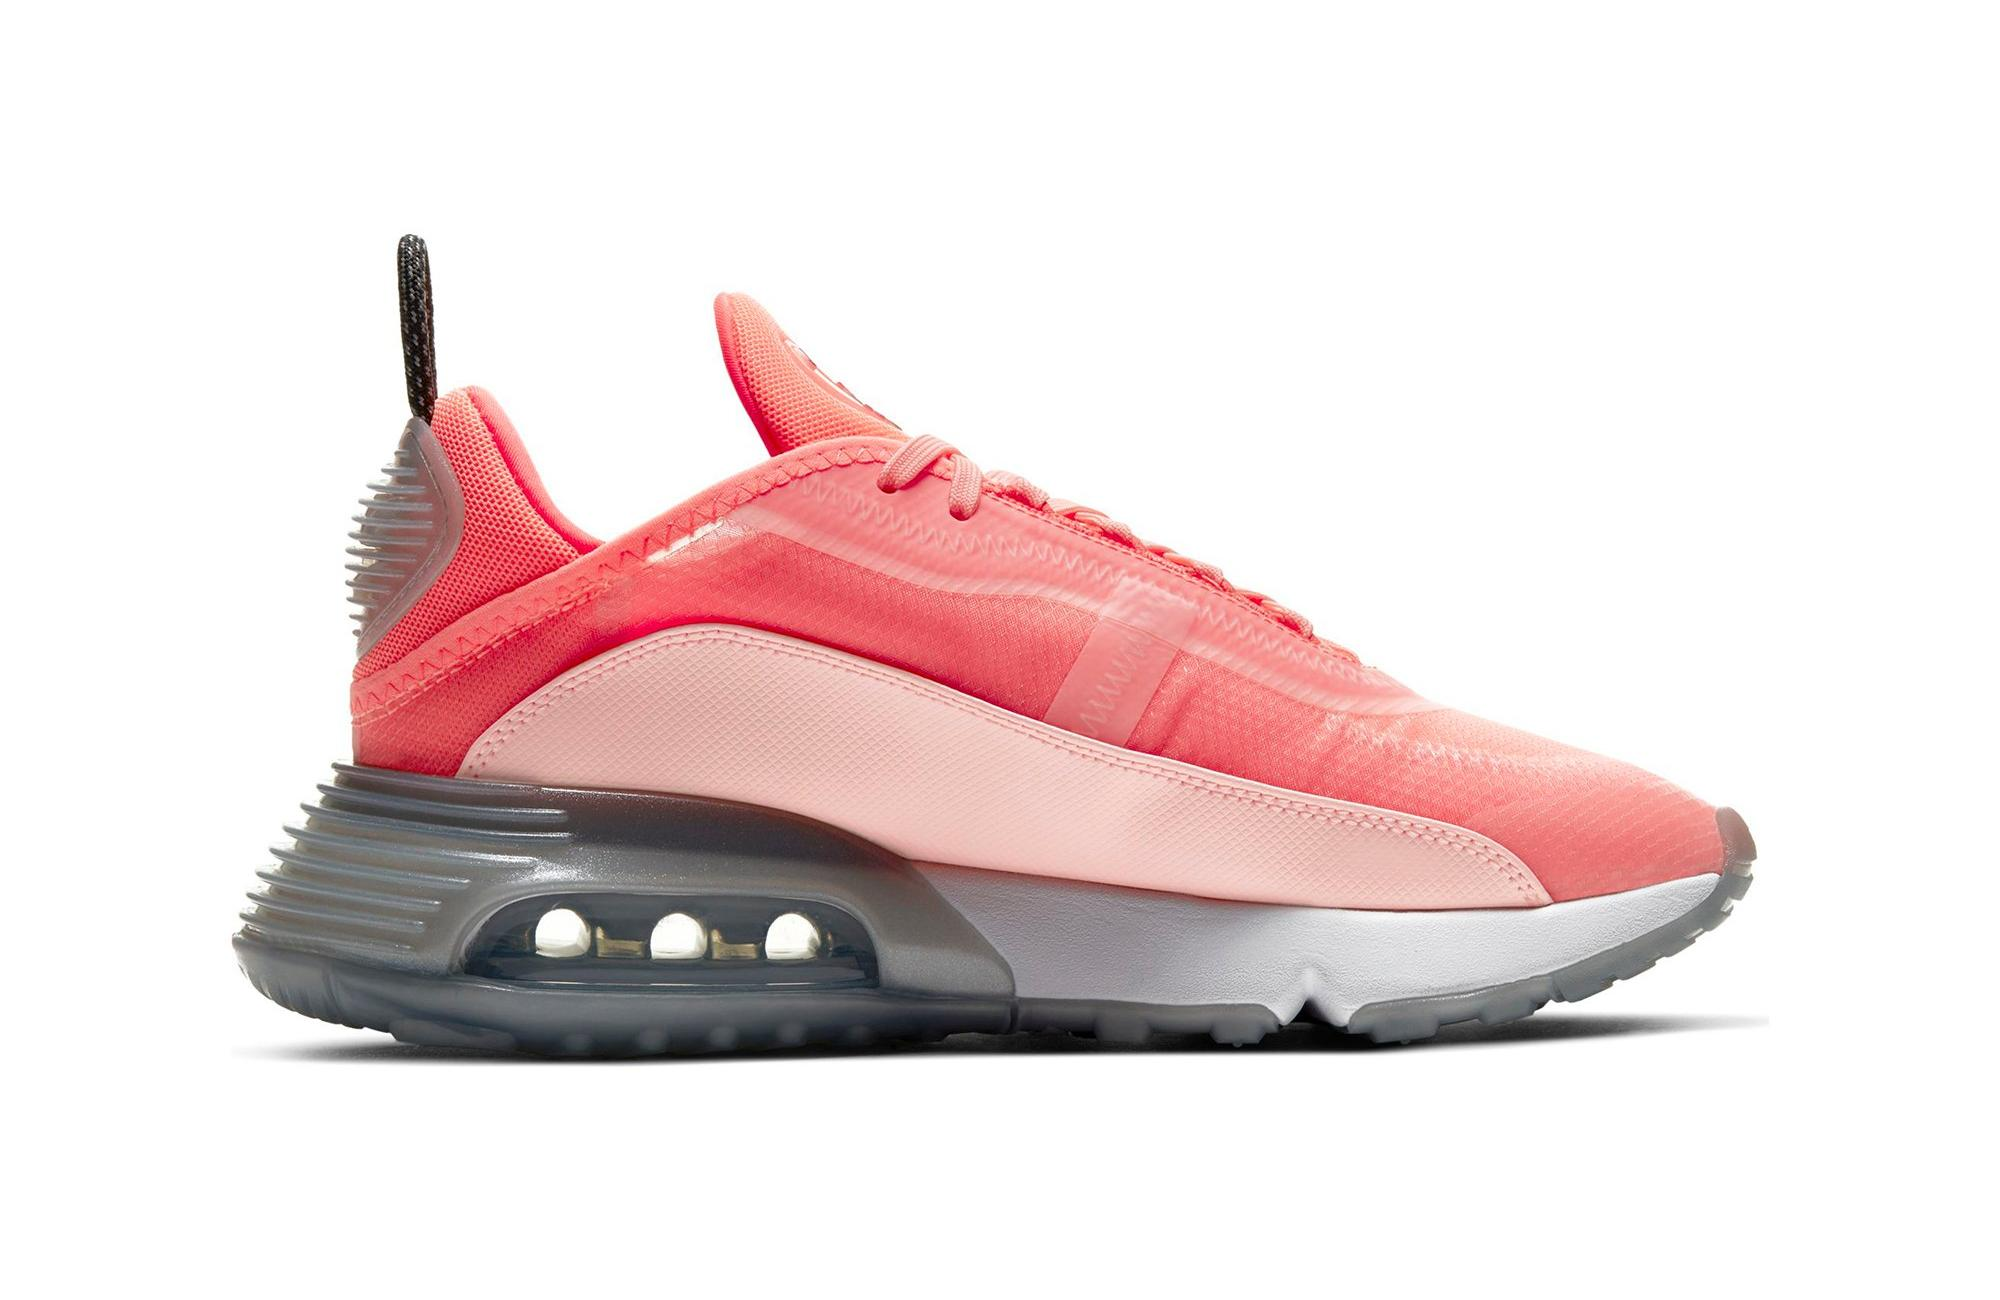 Nike Air Max 2090 right